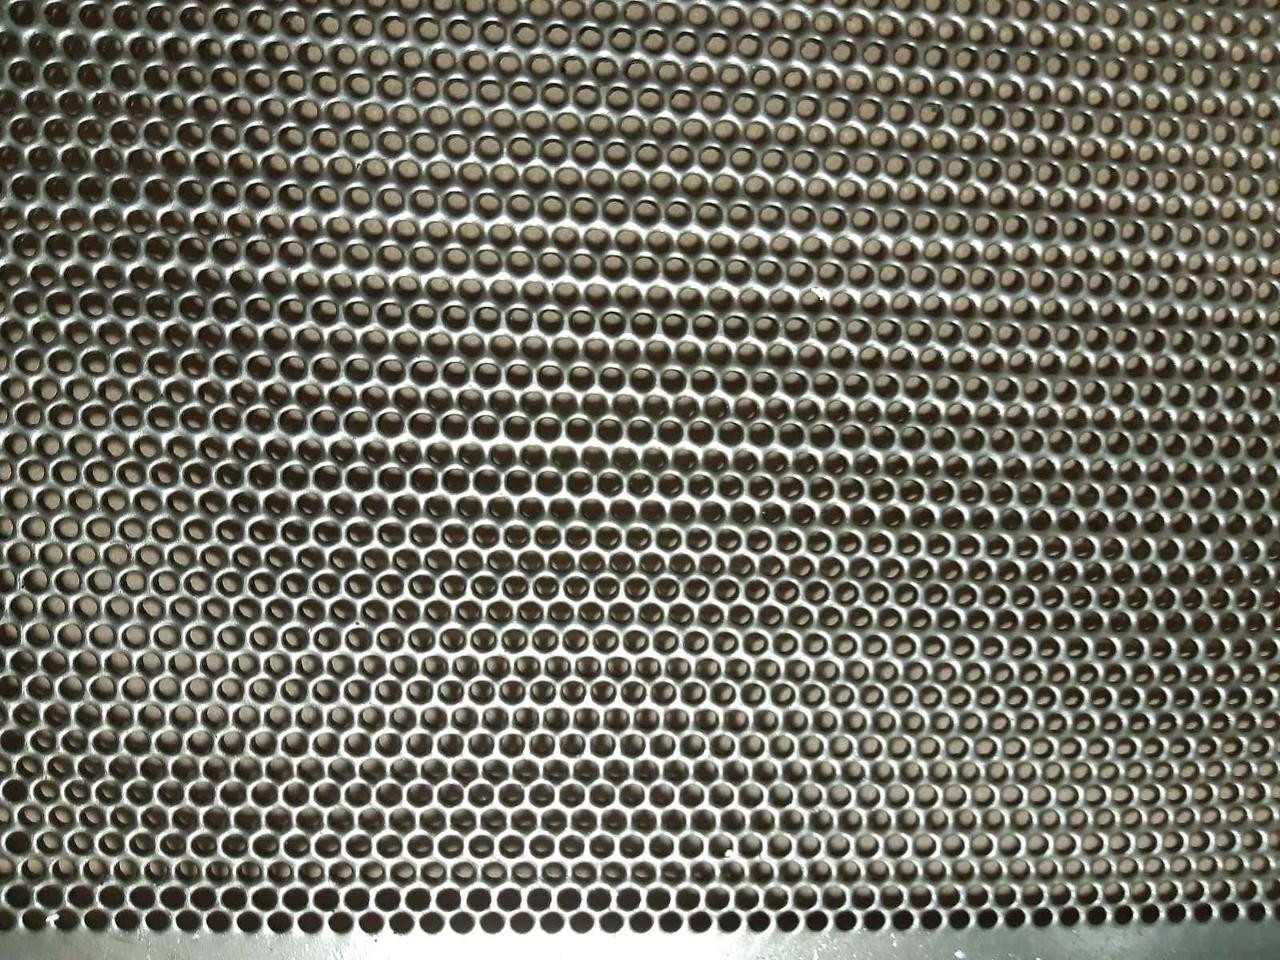 Друшляк (сито) 714 х 292 ОЦ кругле 0,8 мм * 2 / 2,2 / 2,5 /2,8 / 3 мм